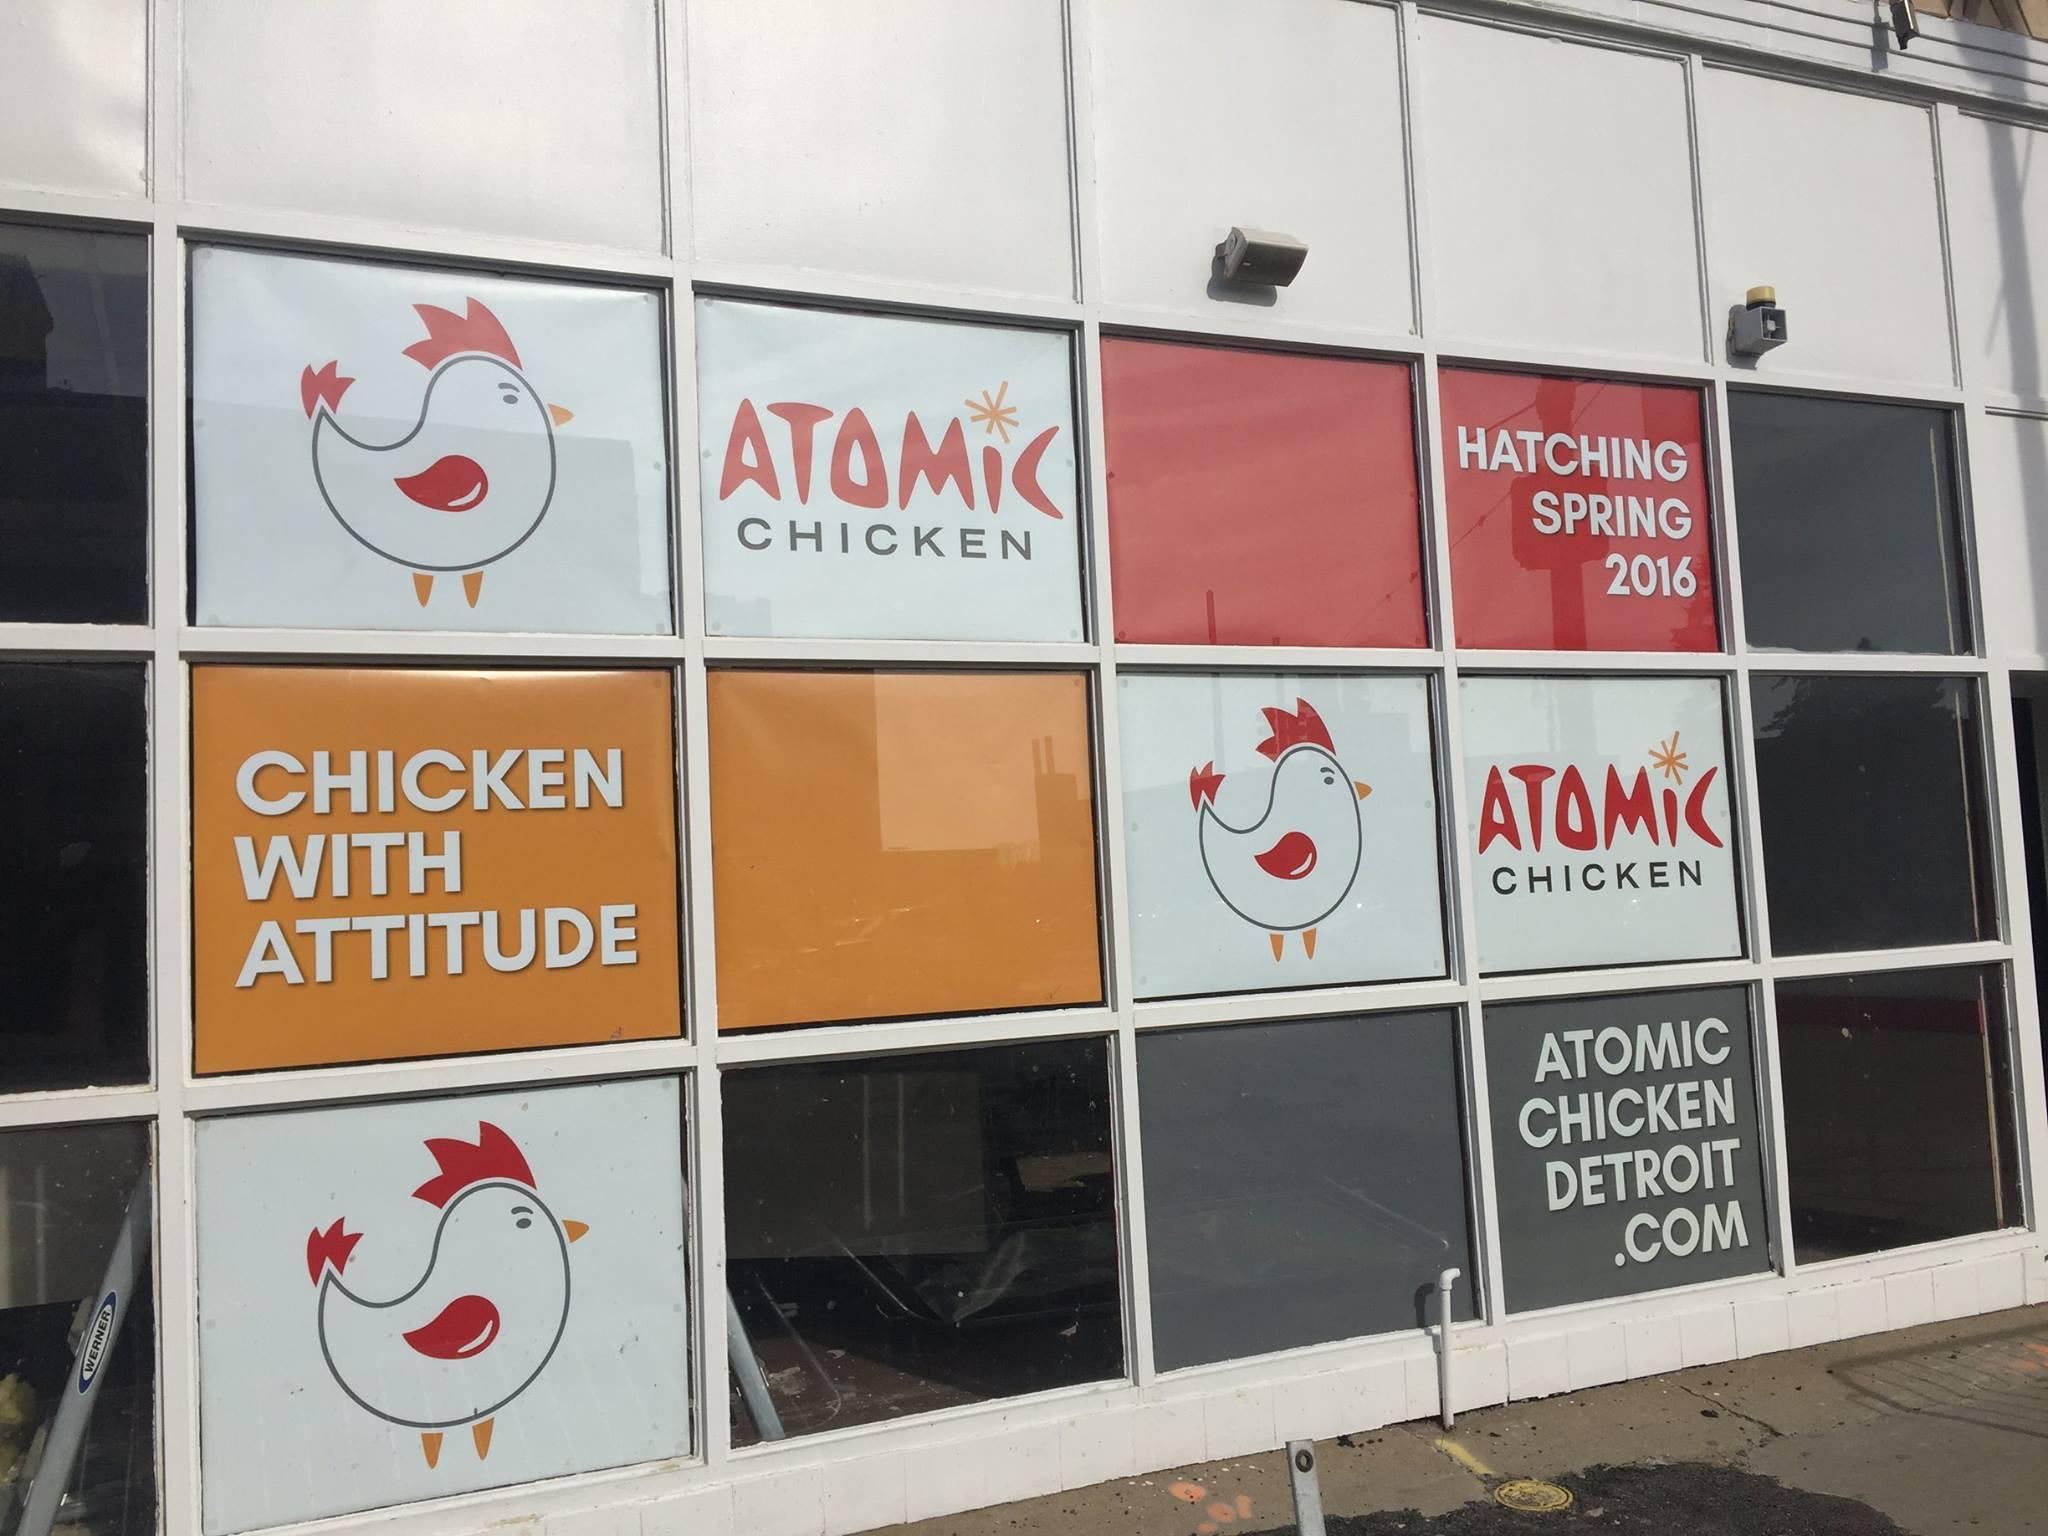 Chickens With Attitude